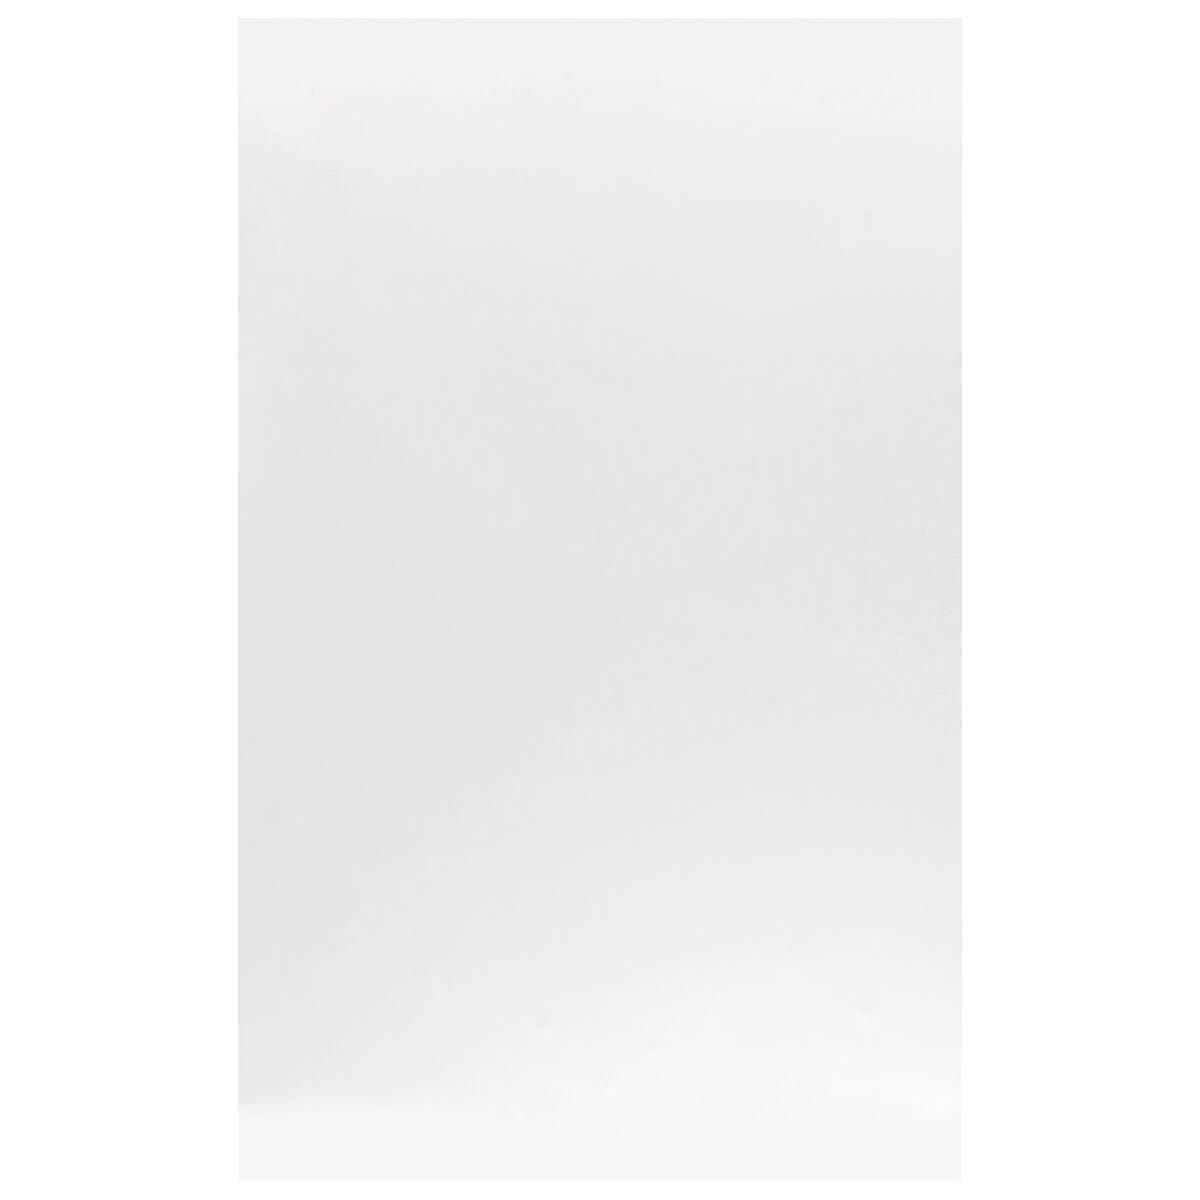 14 x 22 white poster board 8ct